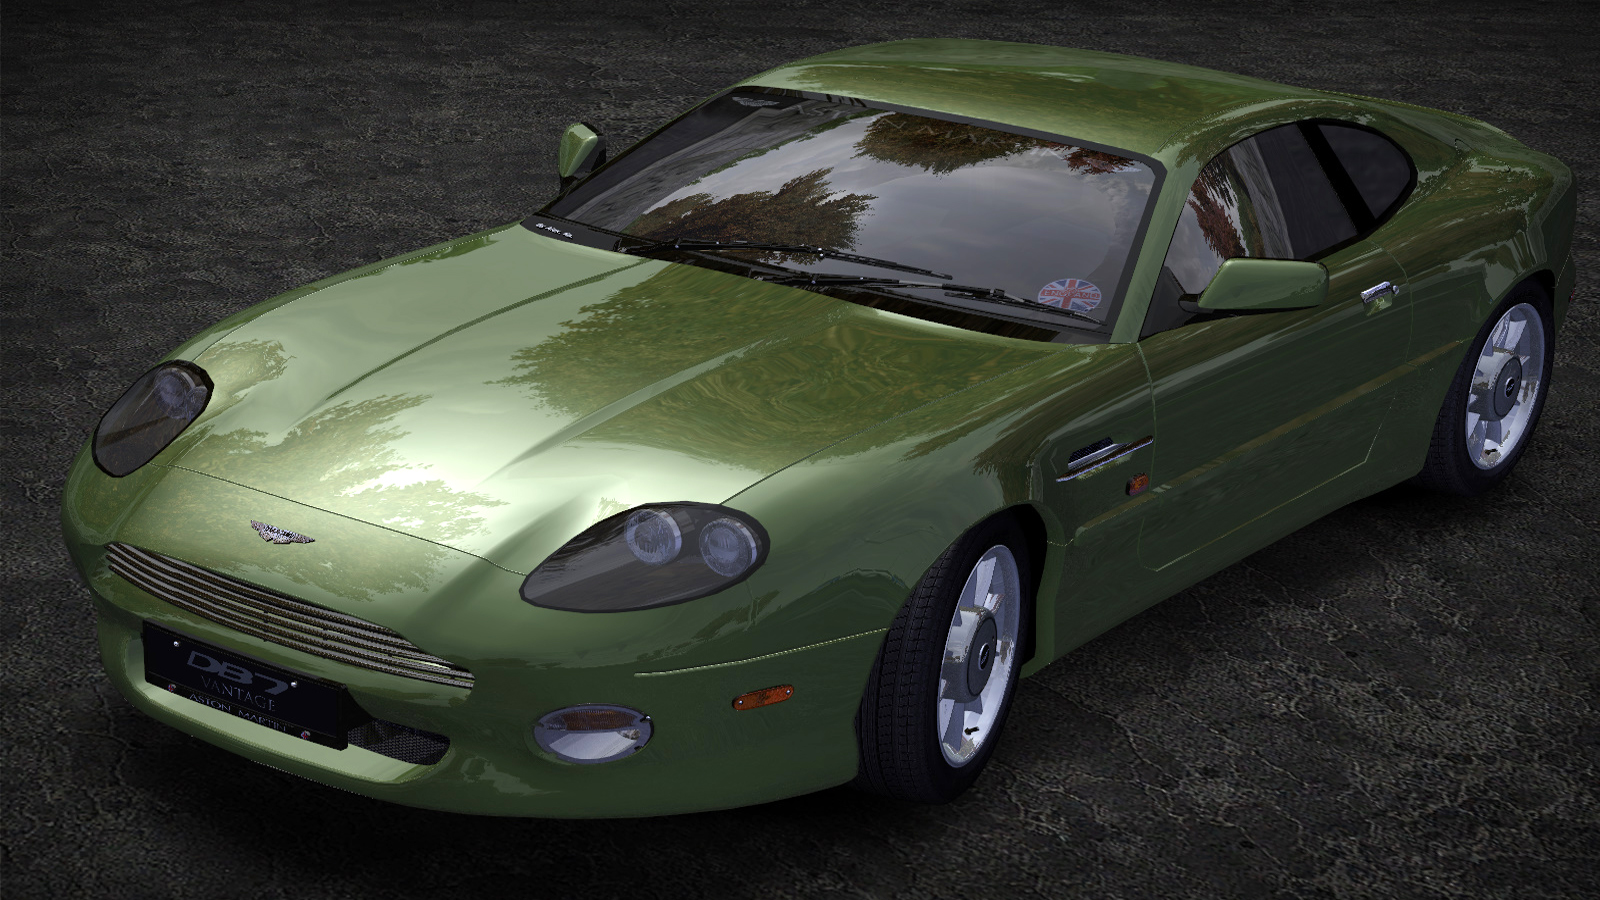 Speed 2020-01-05 19-19-22-829.jpg - Need for Speed: Most Wanted (2005) Aston Martin DB7 Vantage, Автомобиль